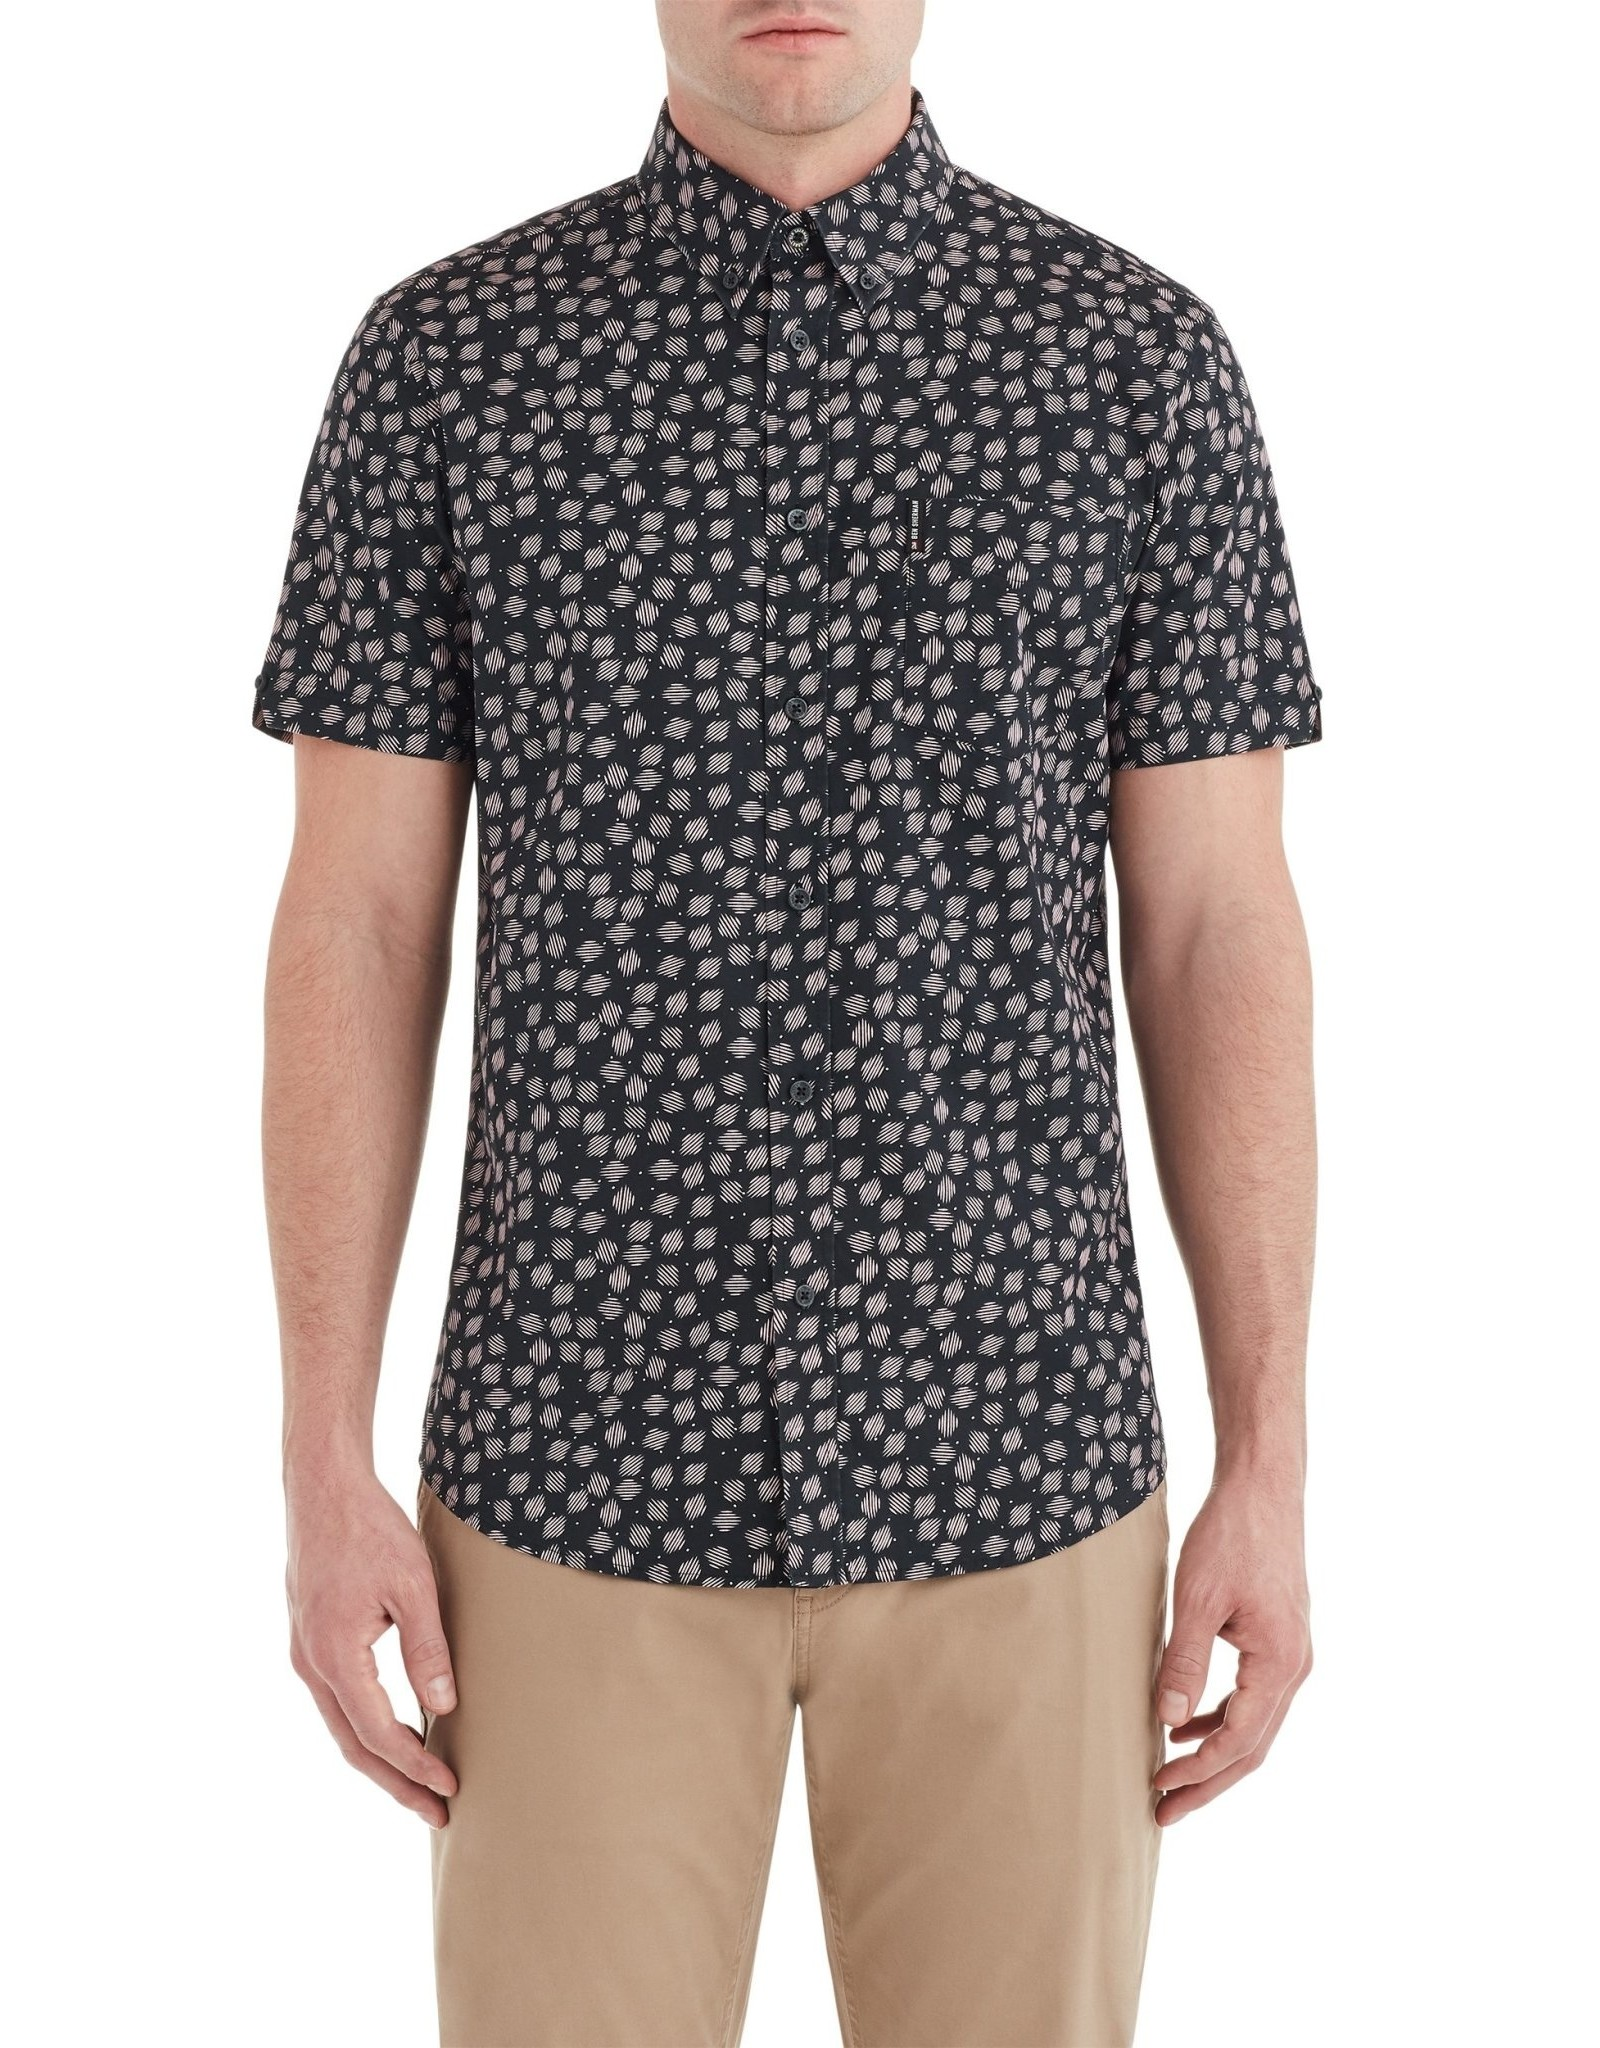 Ben Sherman Scratch Black Shirt